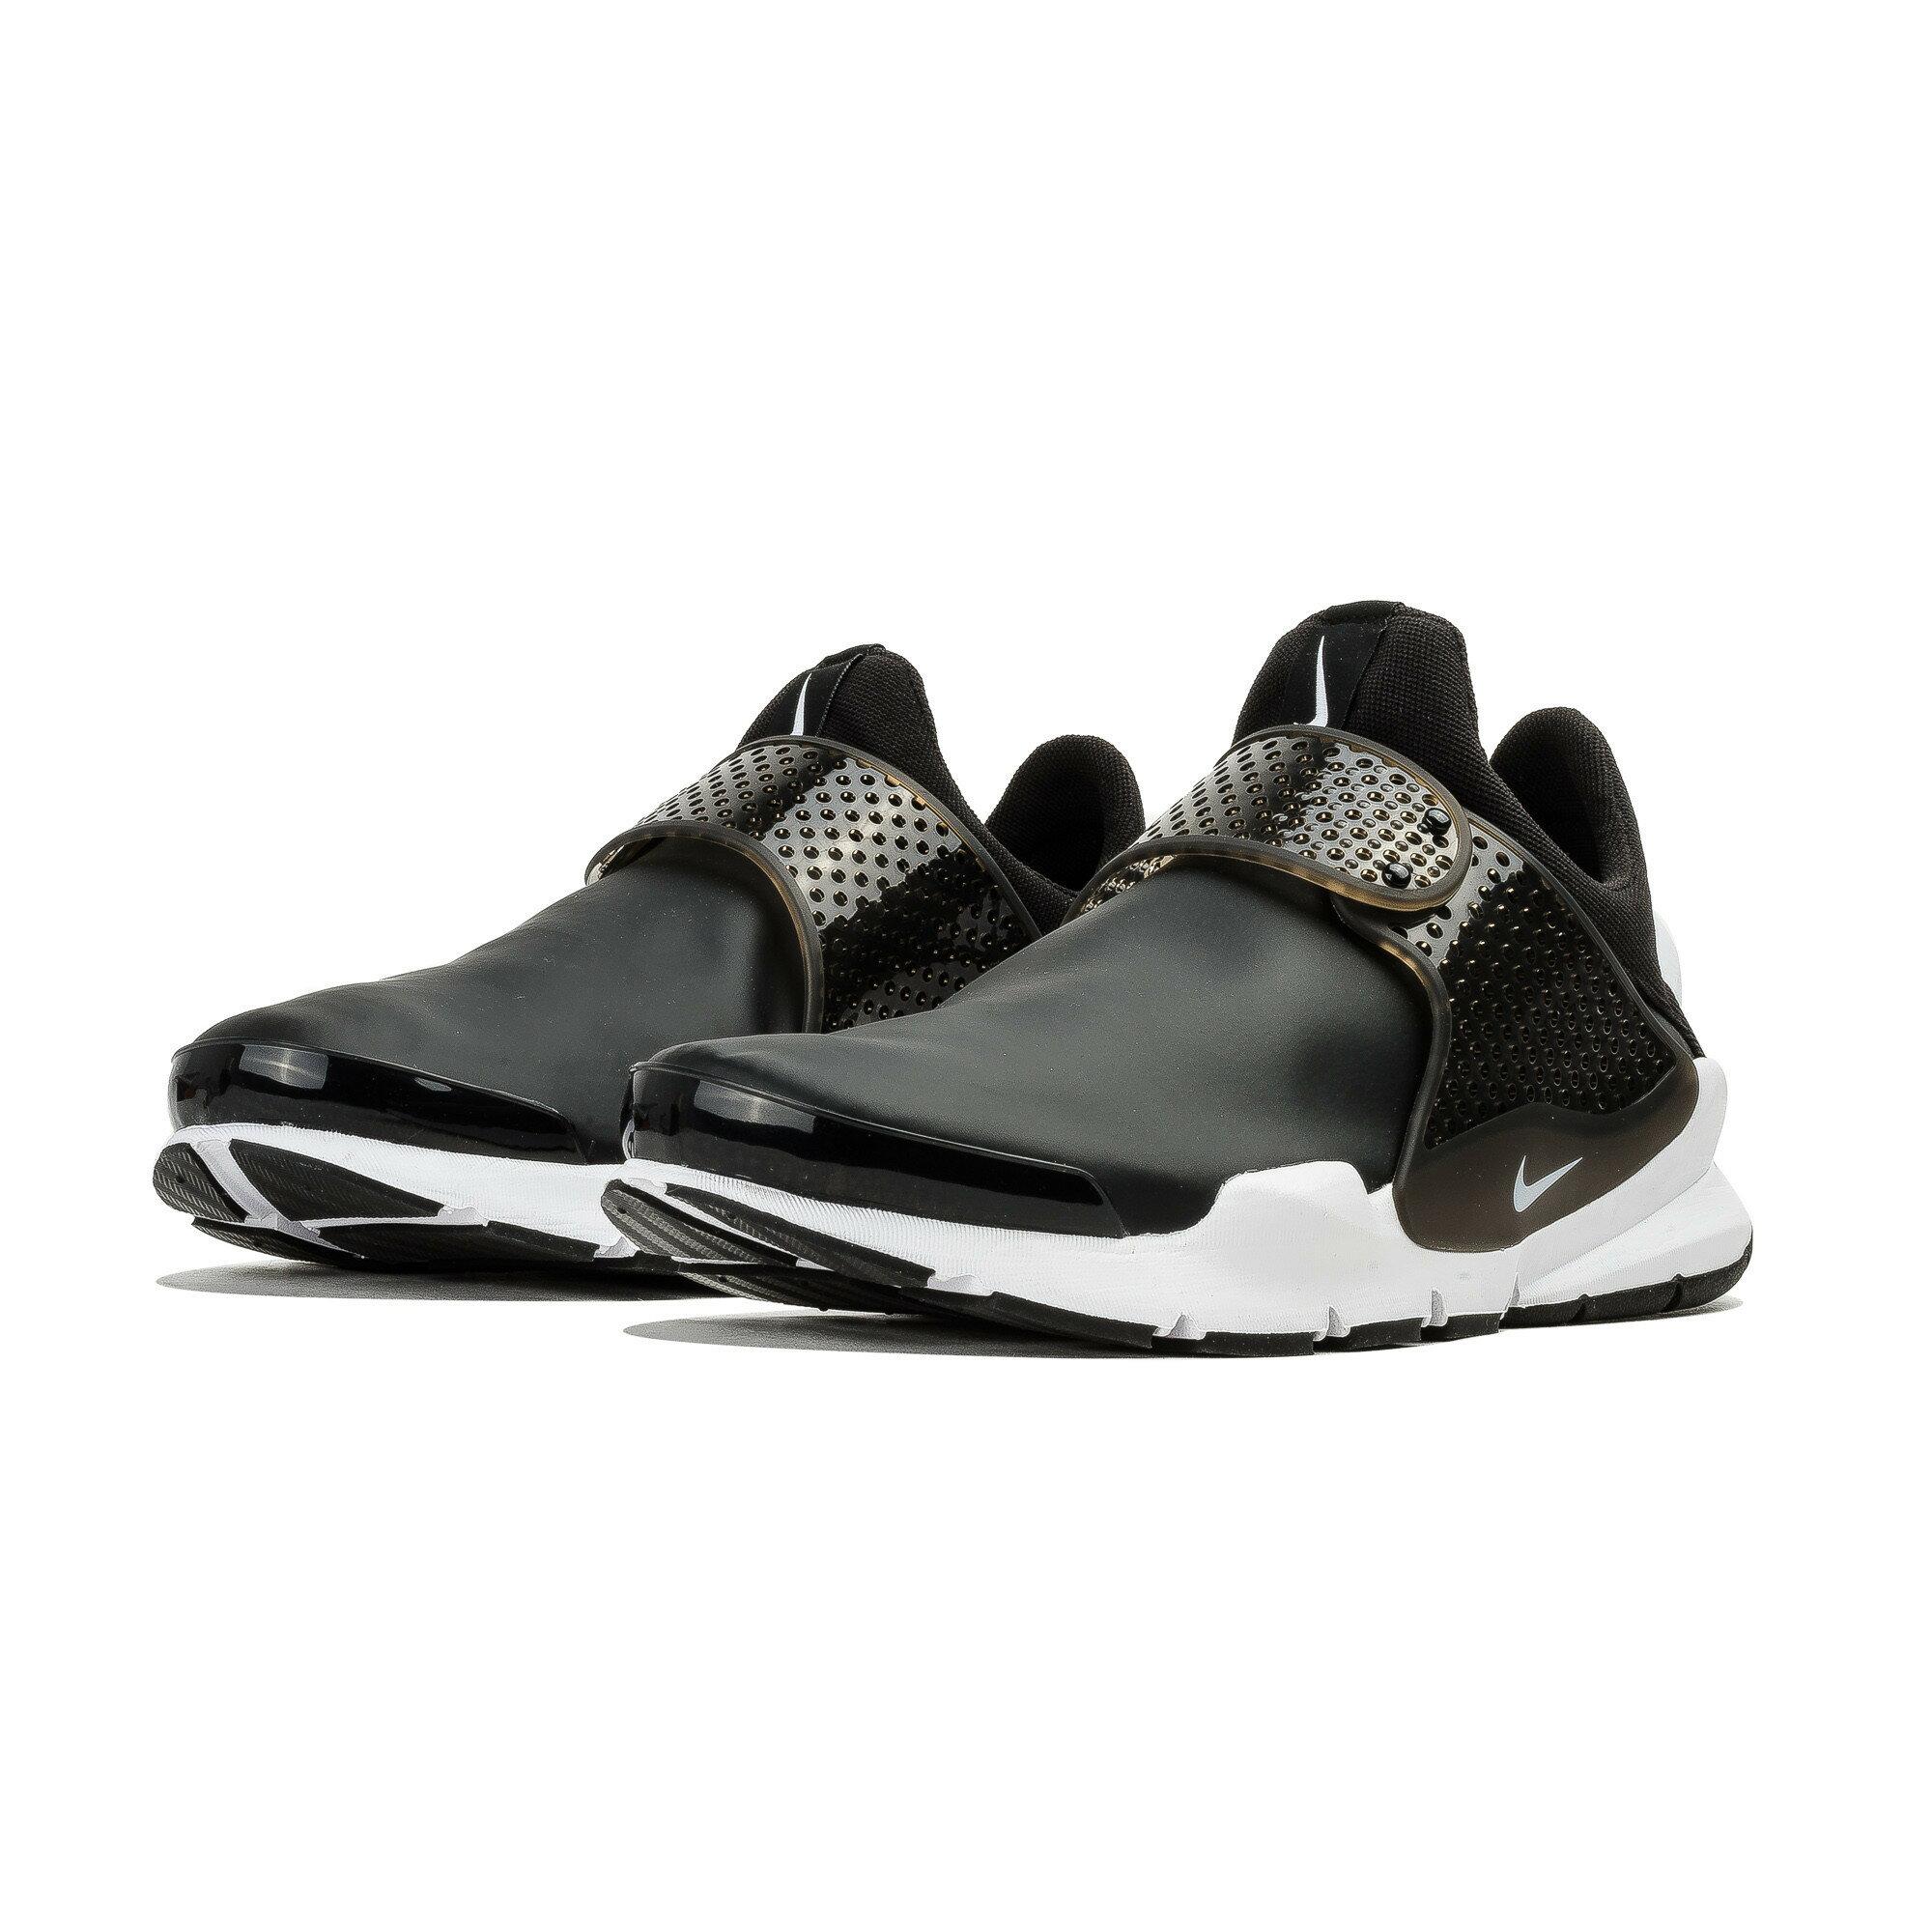 NIKE SOCK DART SE 男鞋 女鞋 慢跑 休閒 襪套 防水機能布 黑 白 【運動世界】 911404-001